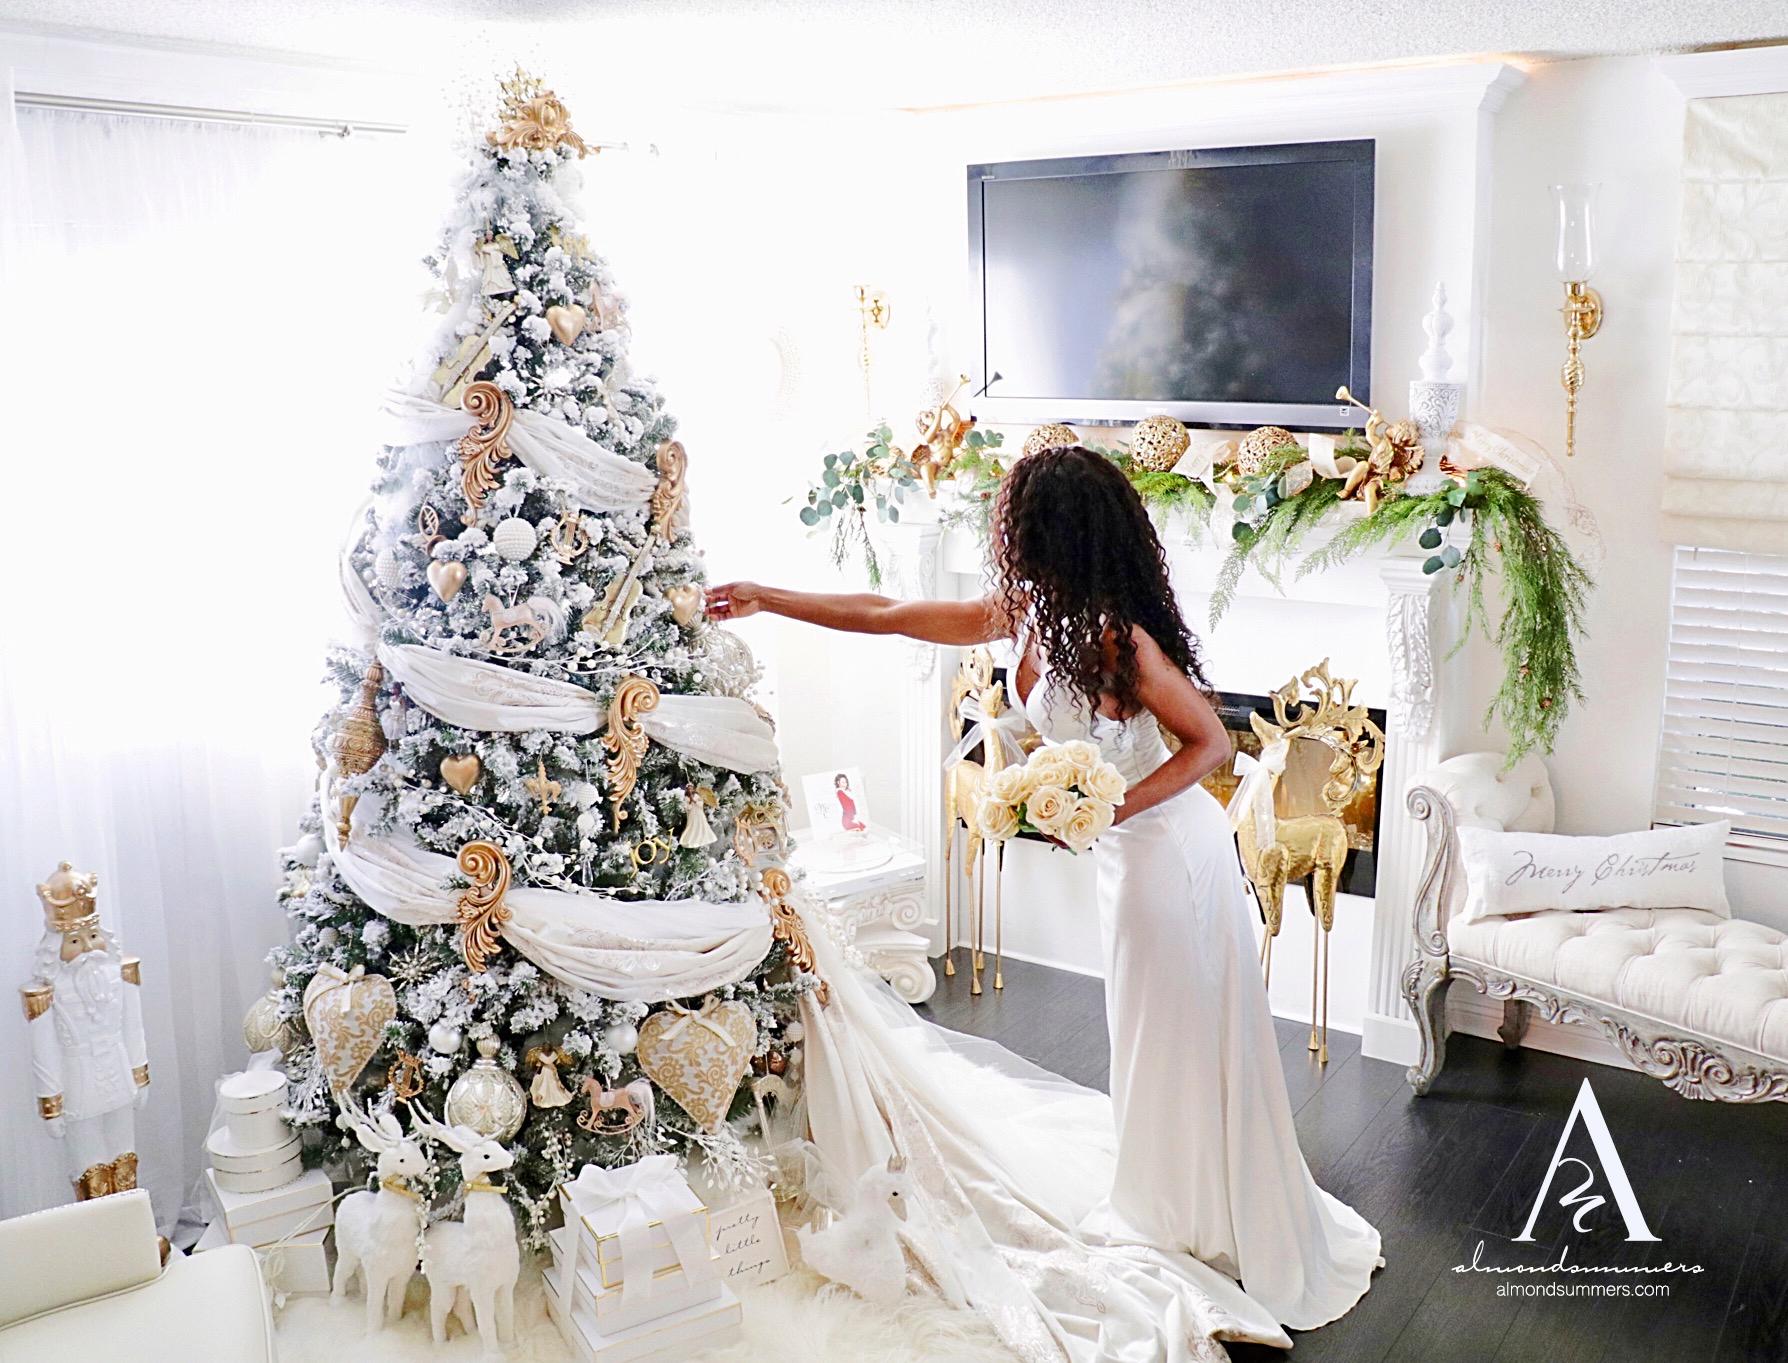 Fairytale Christmas Decorations.Romantic Christmas Decorations 2018 Fairy Tale Romantic